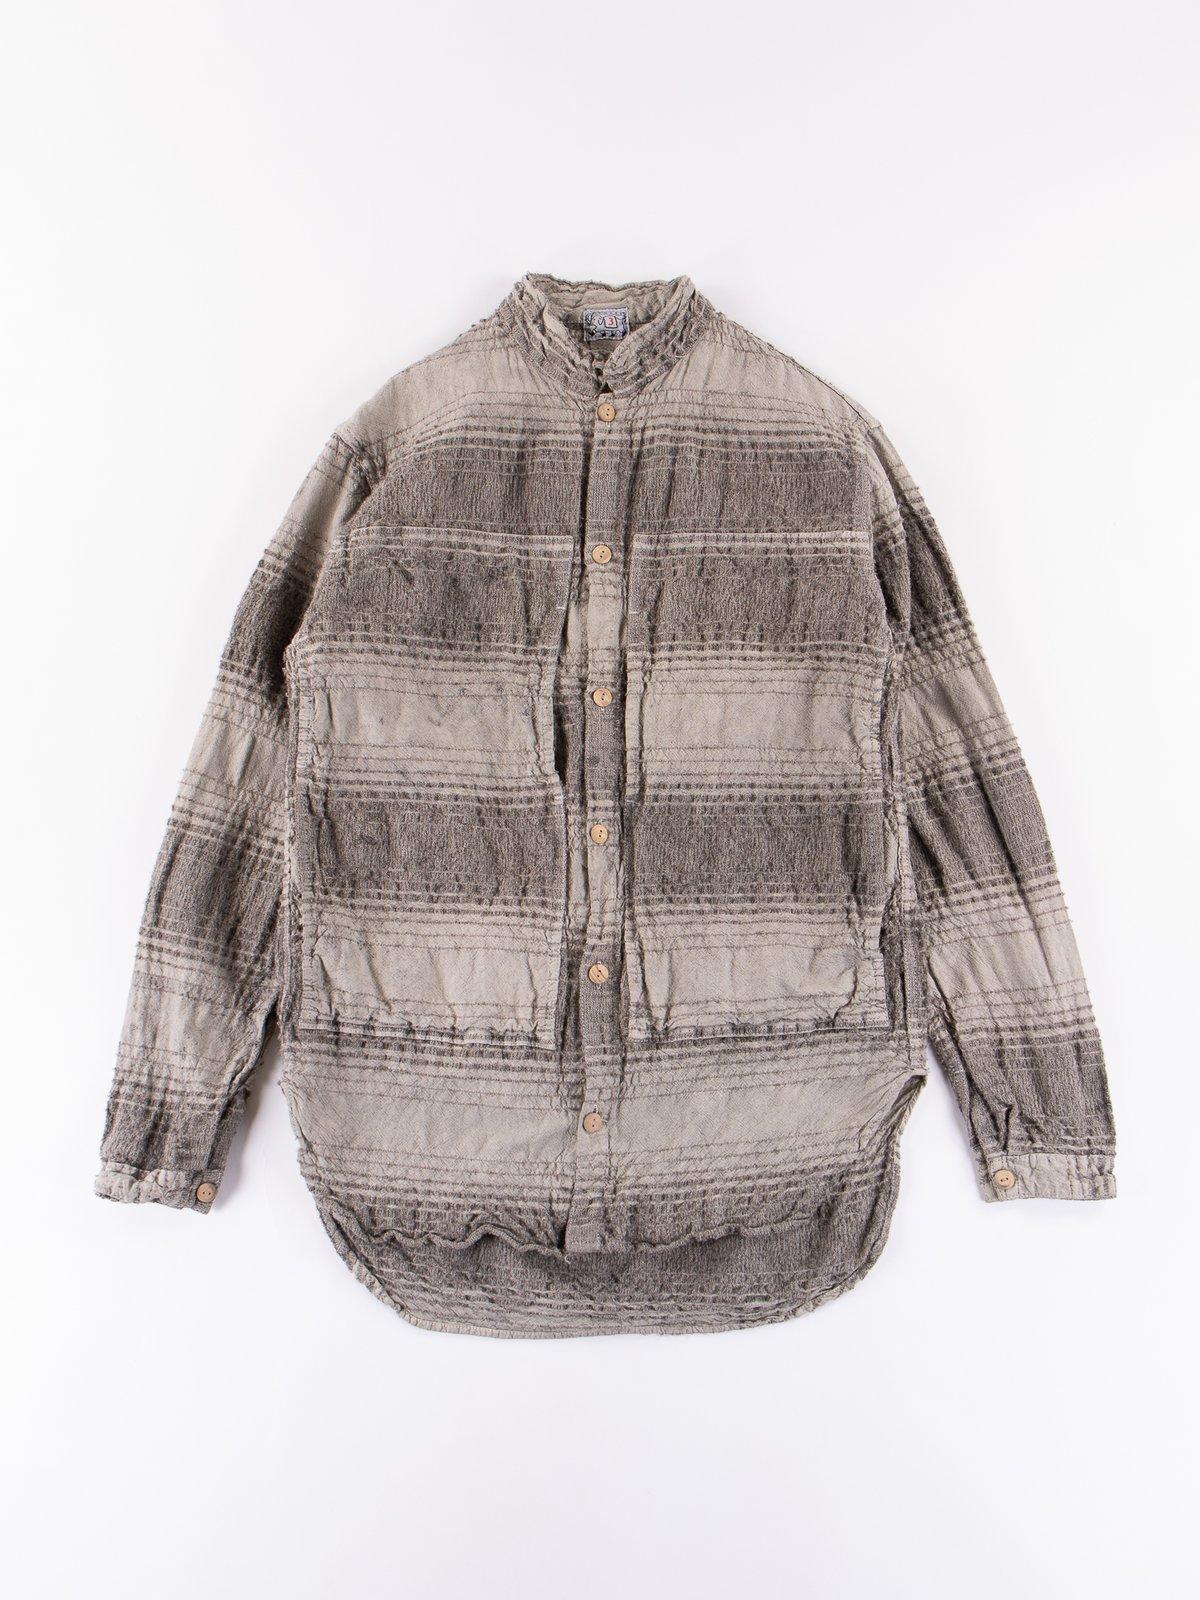 Indian Black Dye Doppler Stripe Calico Periscope Pocket Tail Shirt - Image 1